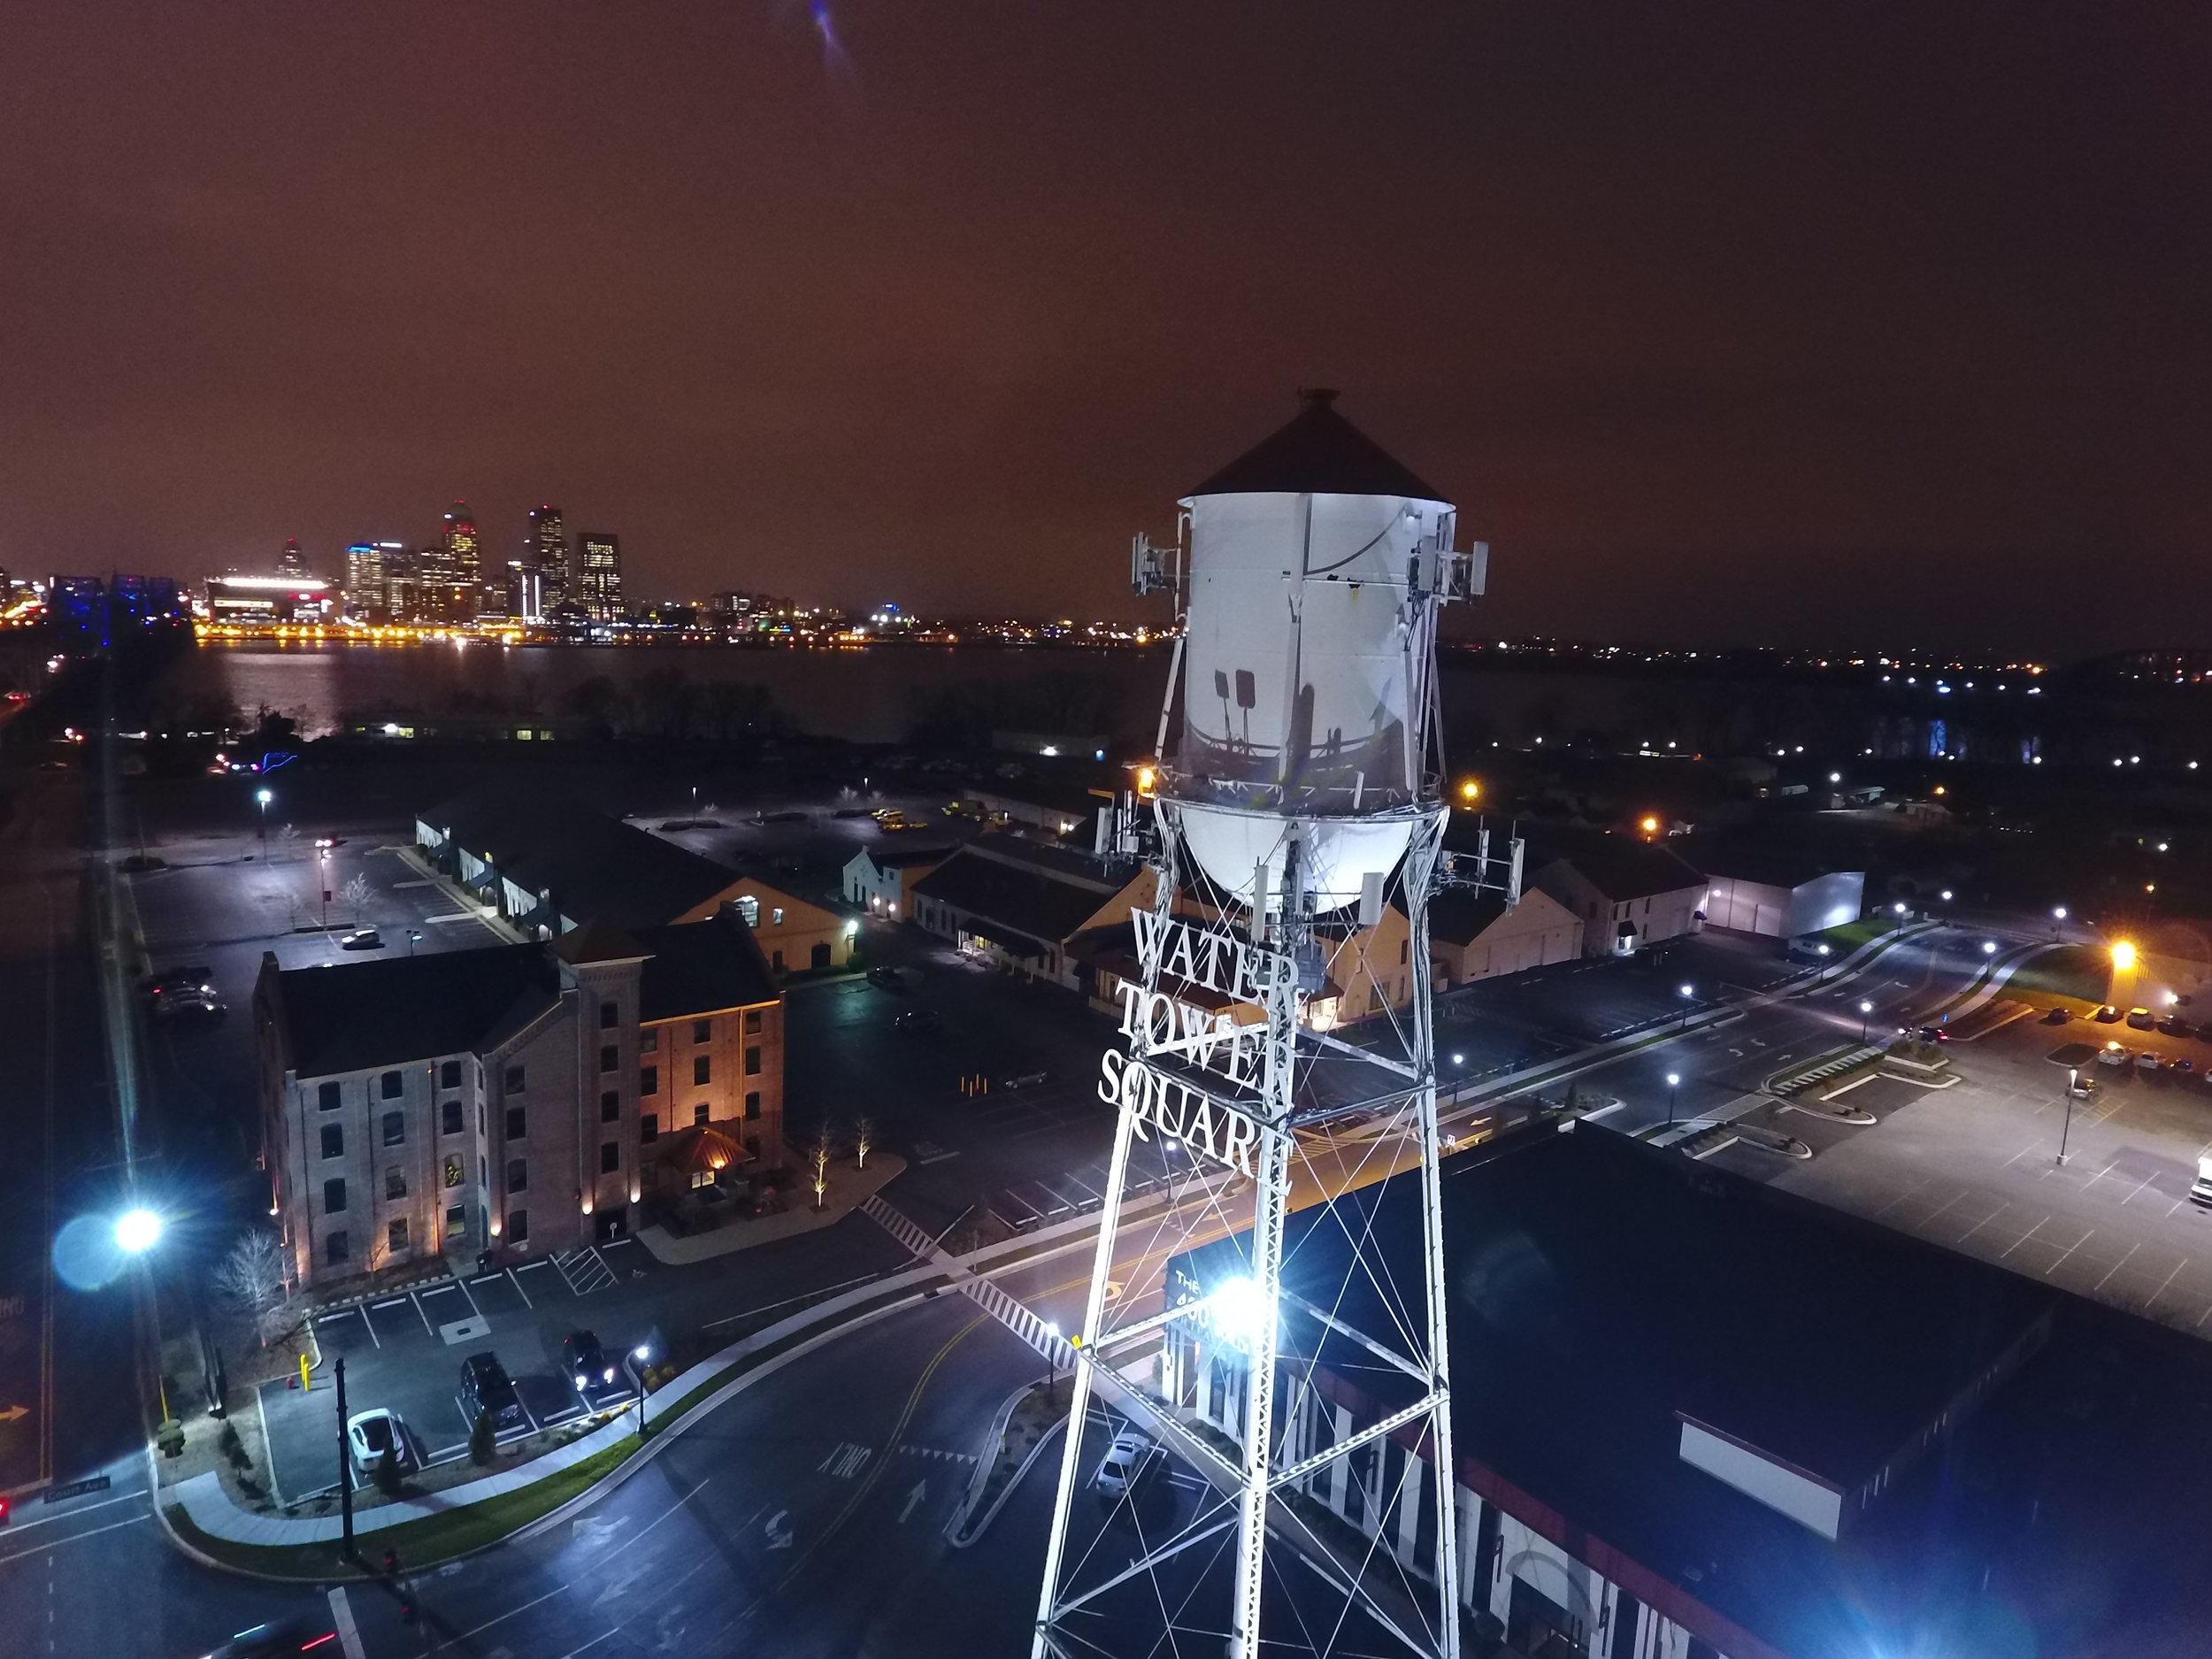 water tower night skyline.JPG